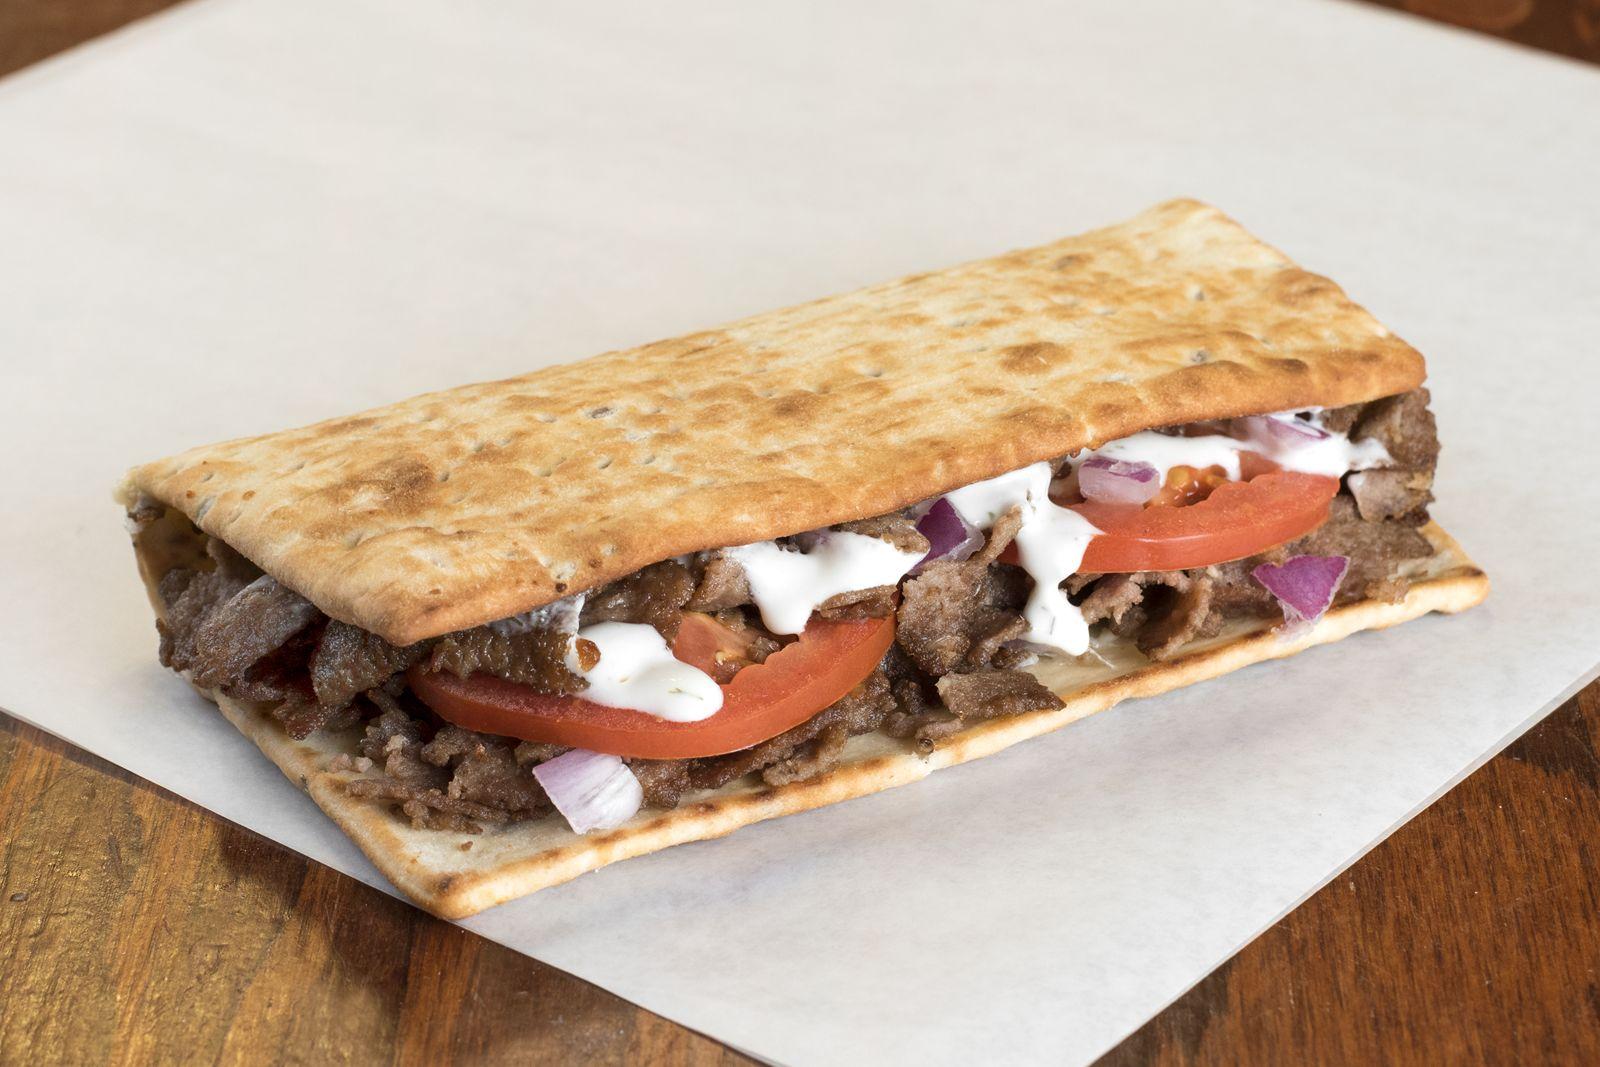 Opa! Potbelly Sandwich Shop Adds Greek Gyro FLATS to Menus Nationwide